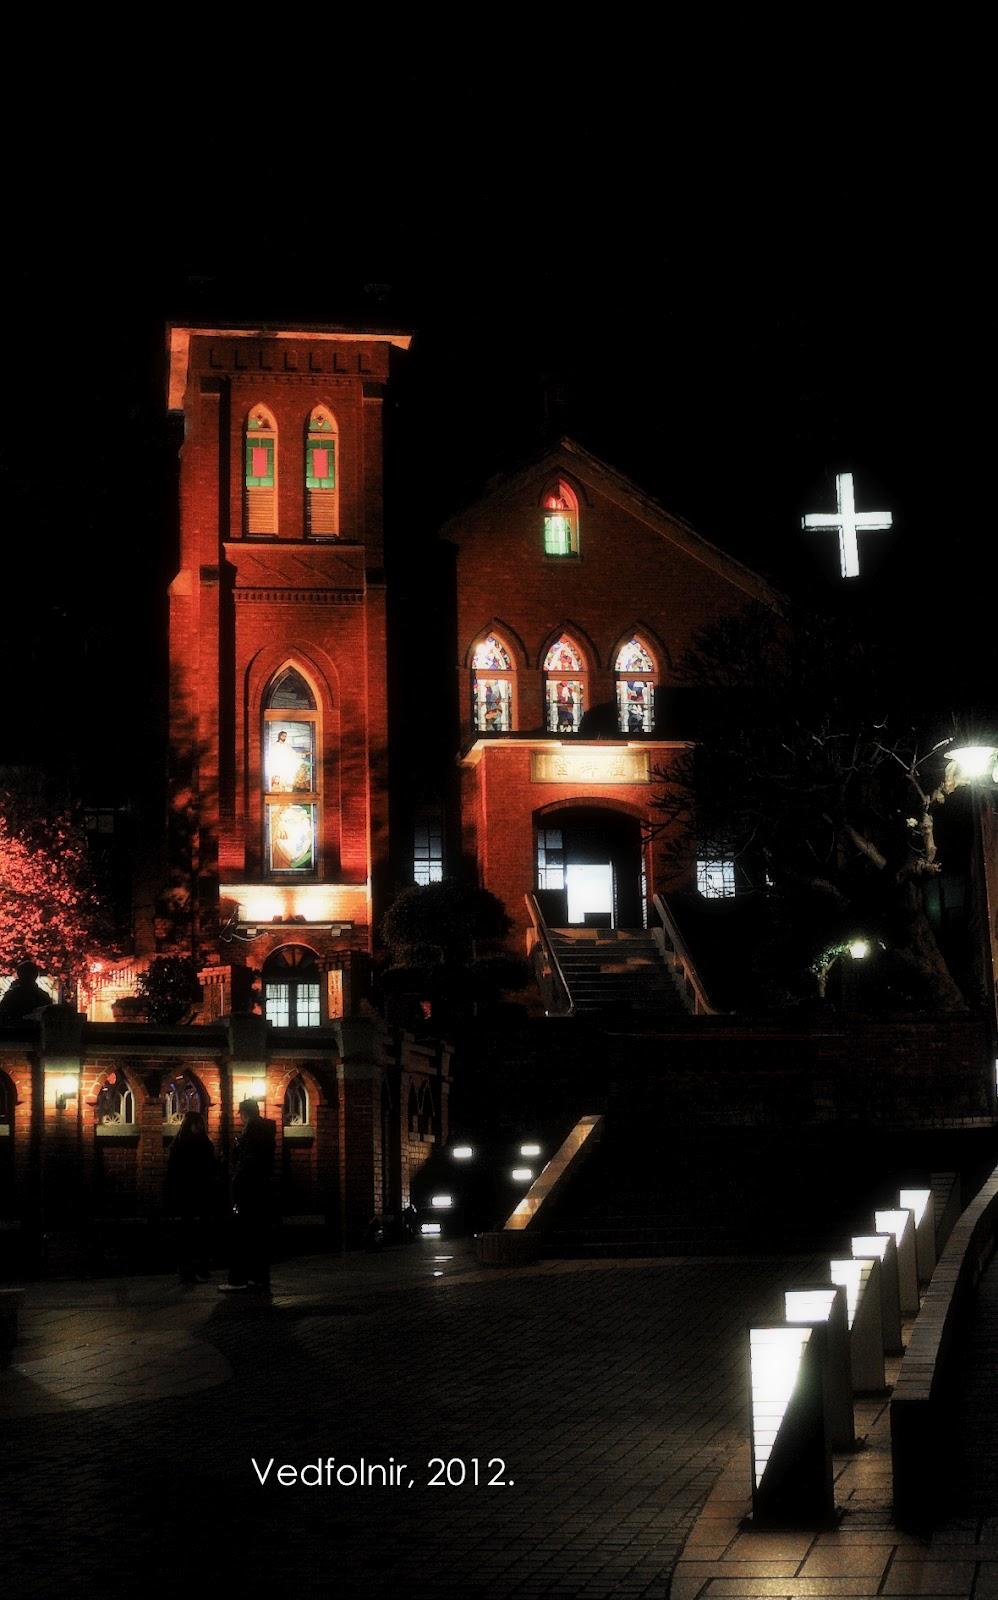 Mackay Church chapel in Tamsui 02 淡水禮拜堂(馬偕教堂)淡水攝影師最愛私房景點介紹